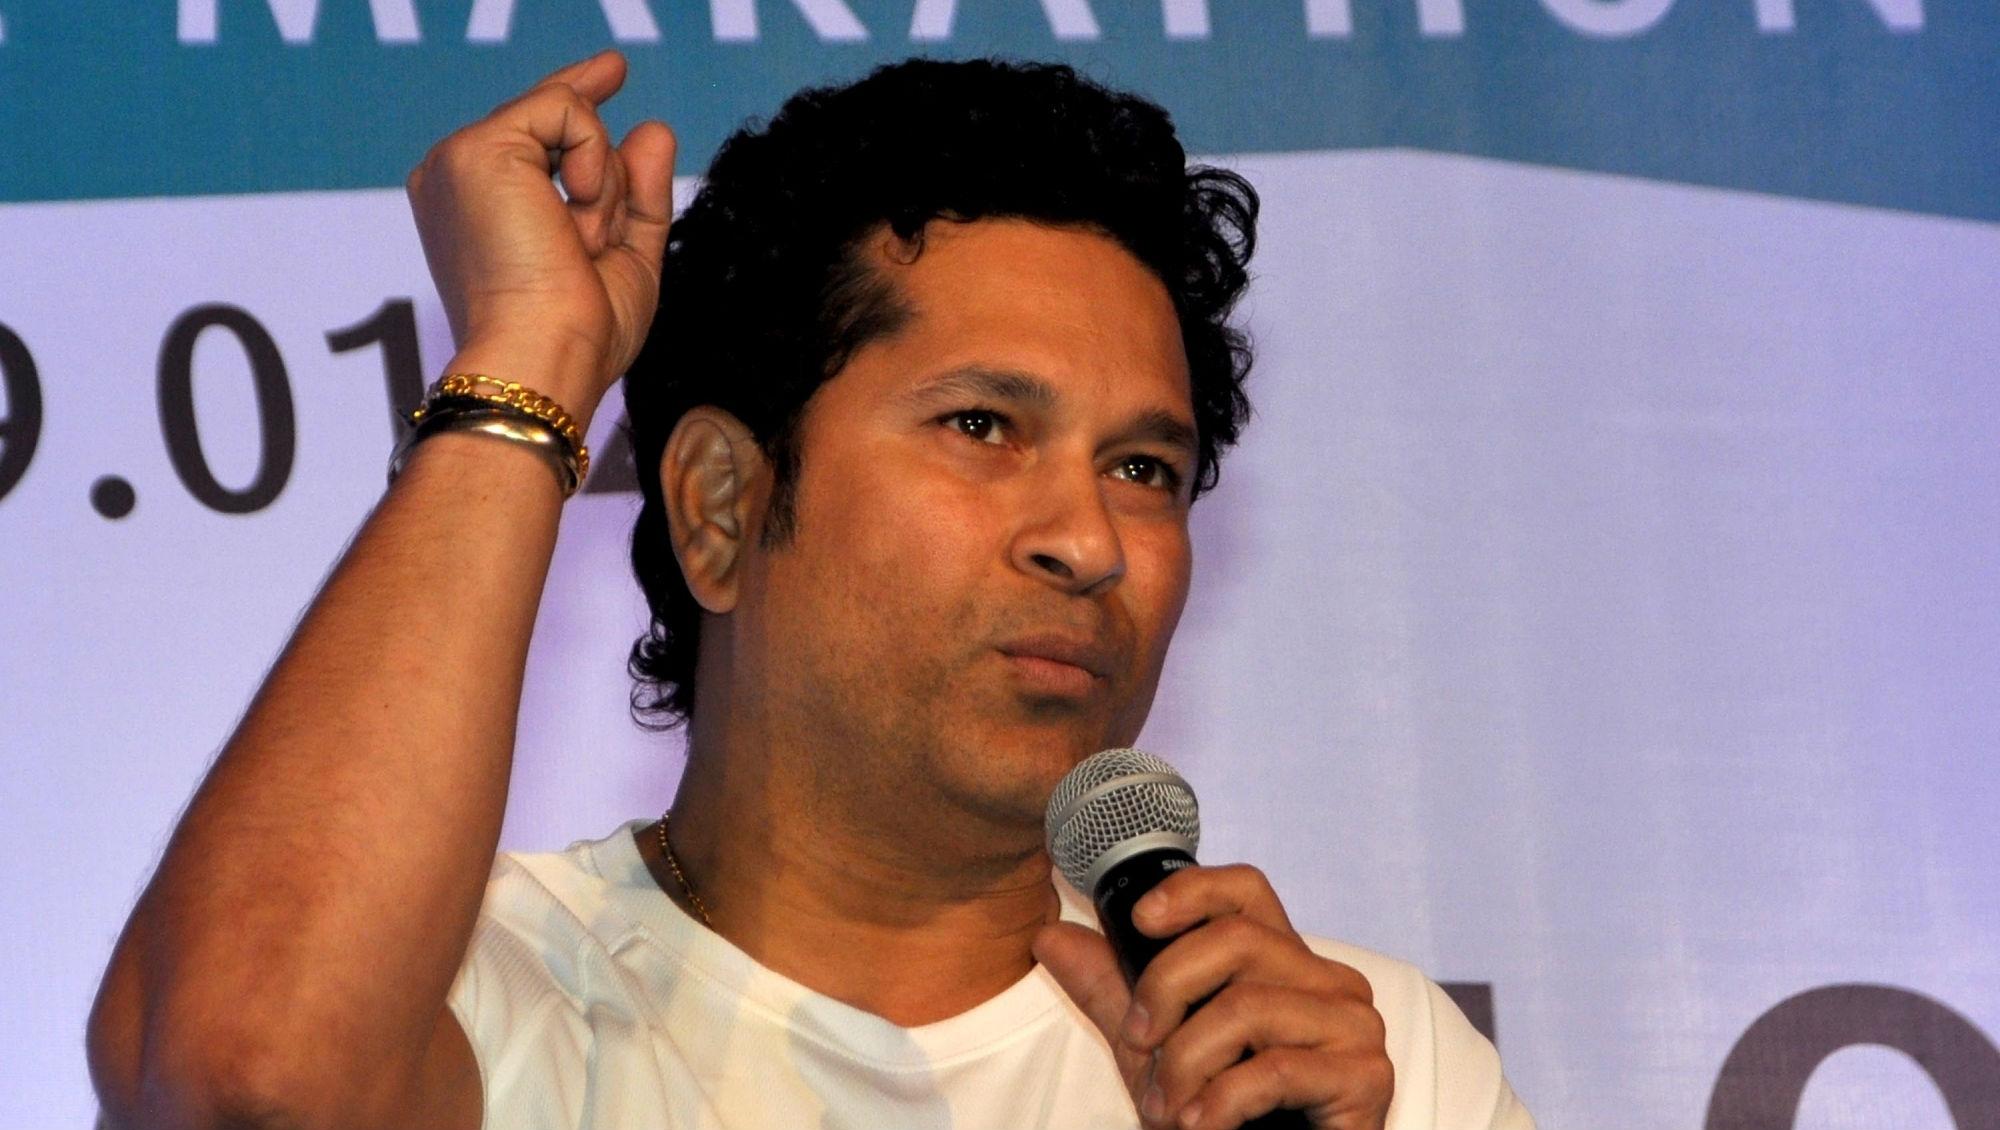 Sachin Tendulkar Says 'Virat Kohli, Ravi Shastri and Sourav Ganguly Must Continue the Good Work'